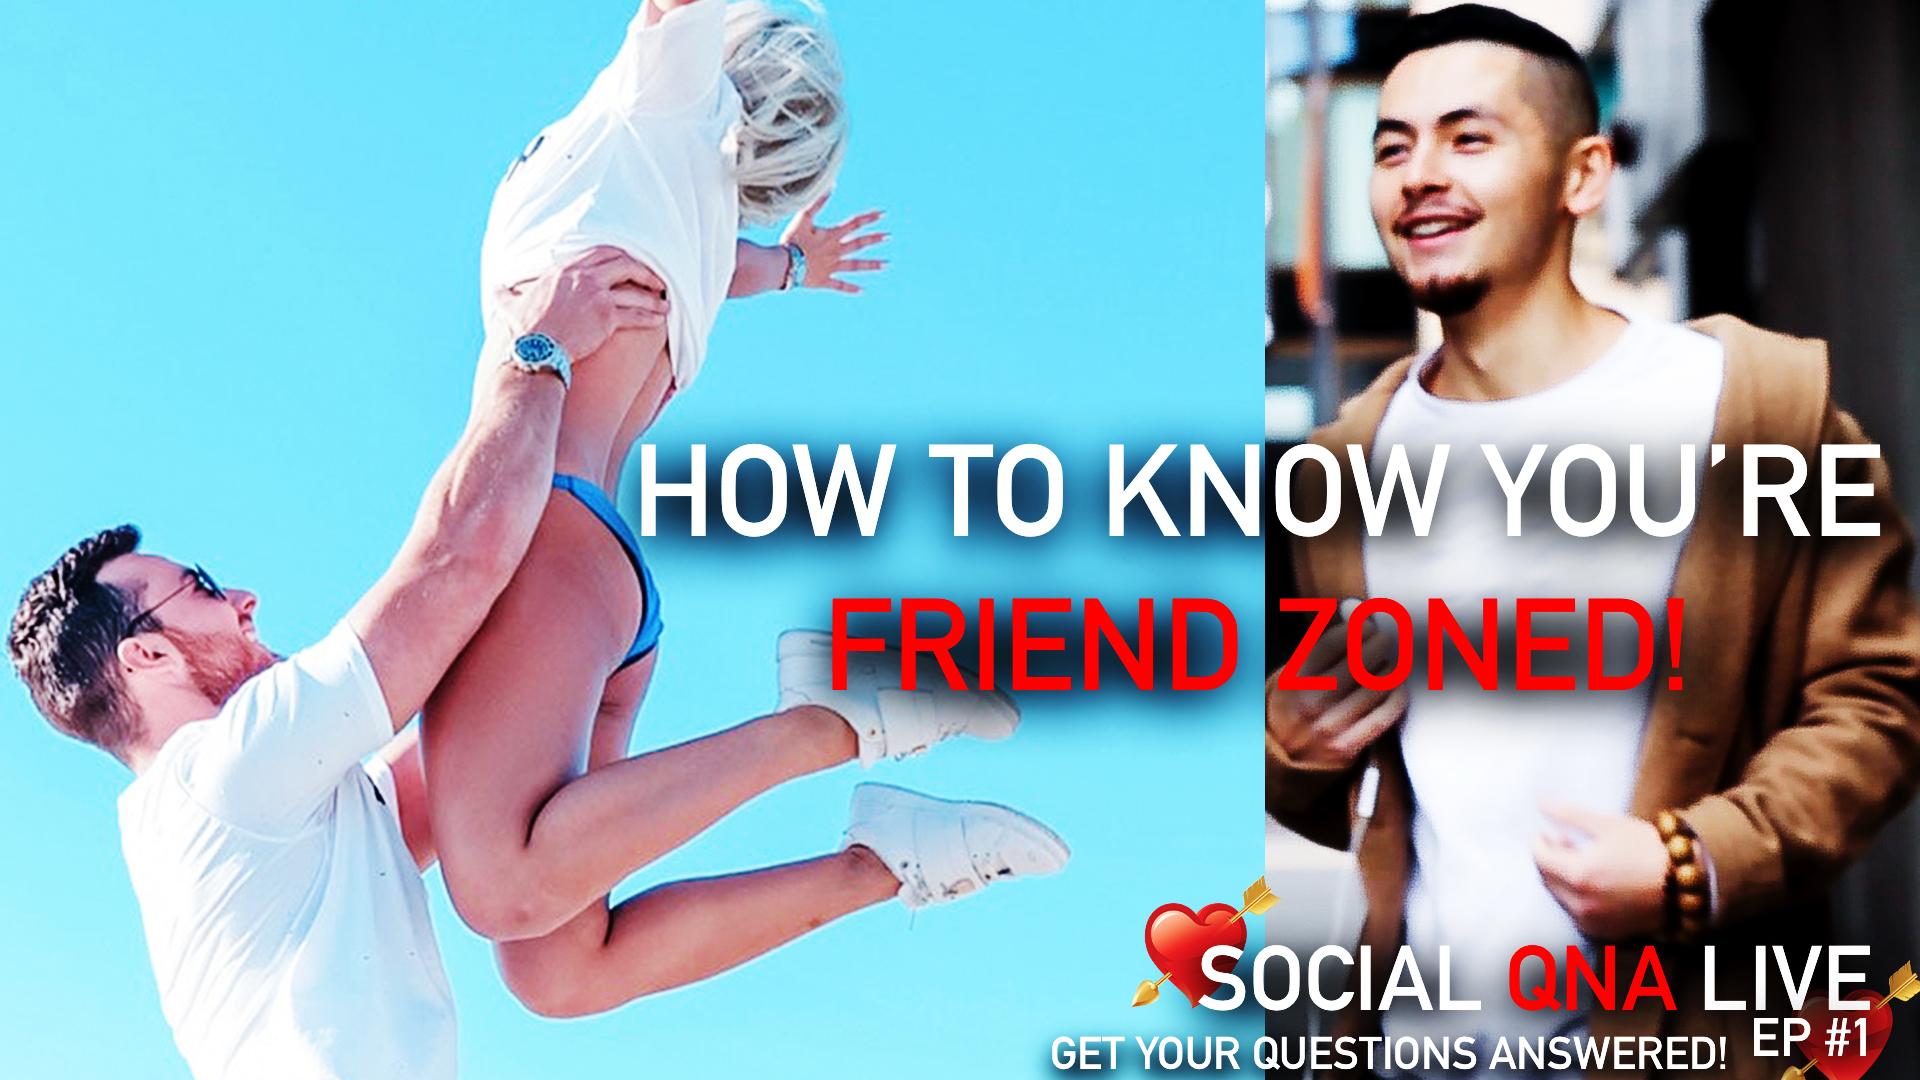 friendzoned_sqna1_thumb.jpg